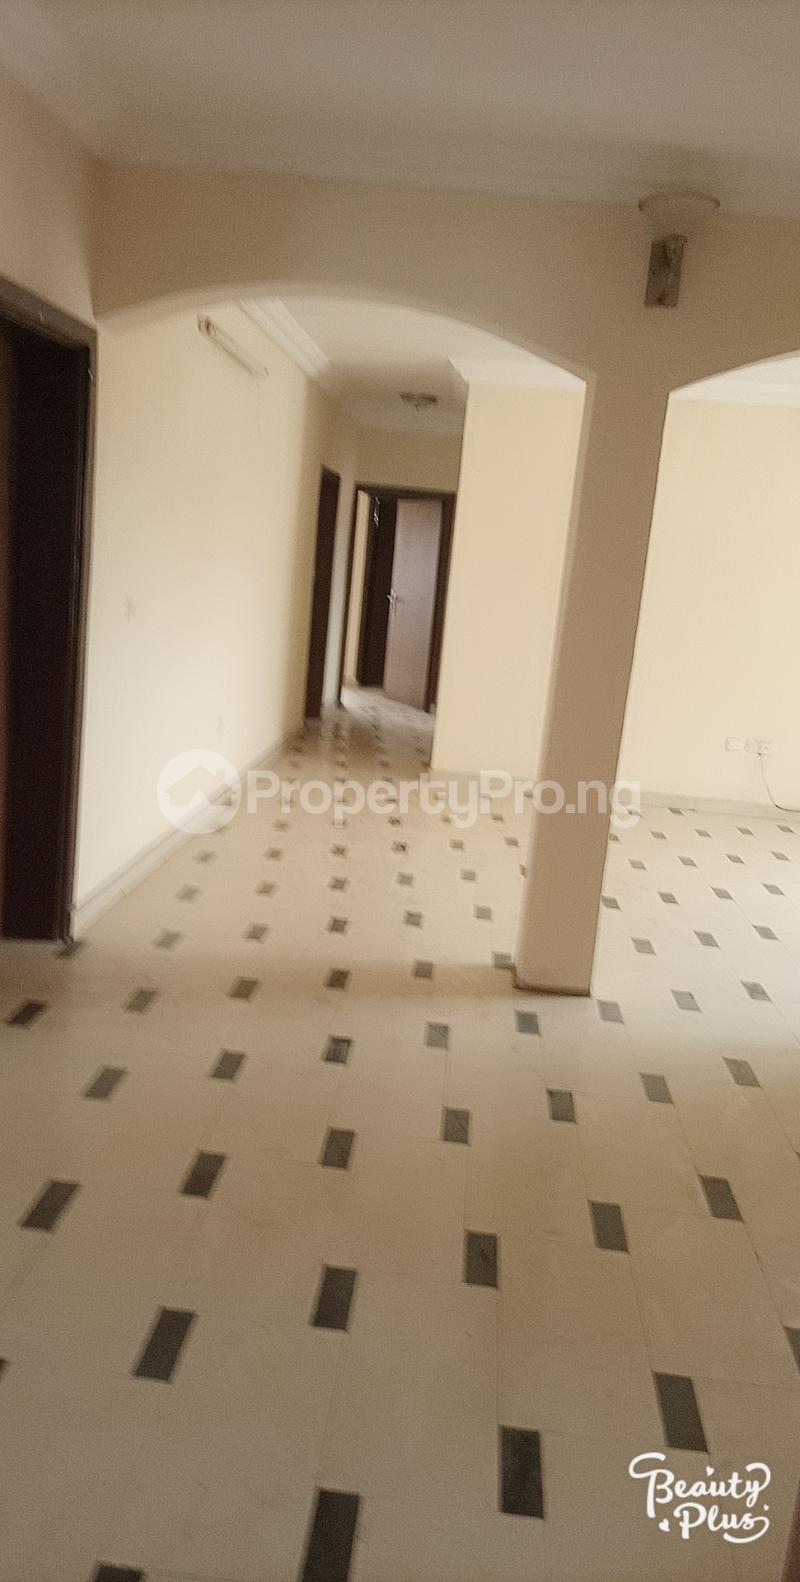 3 bedroom Flat / Apartment for rent Oke Afa isolo. Lagos Mainland Oke-Afa Isolo Lagos - 5